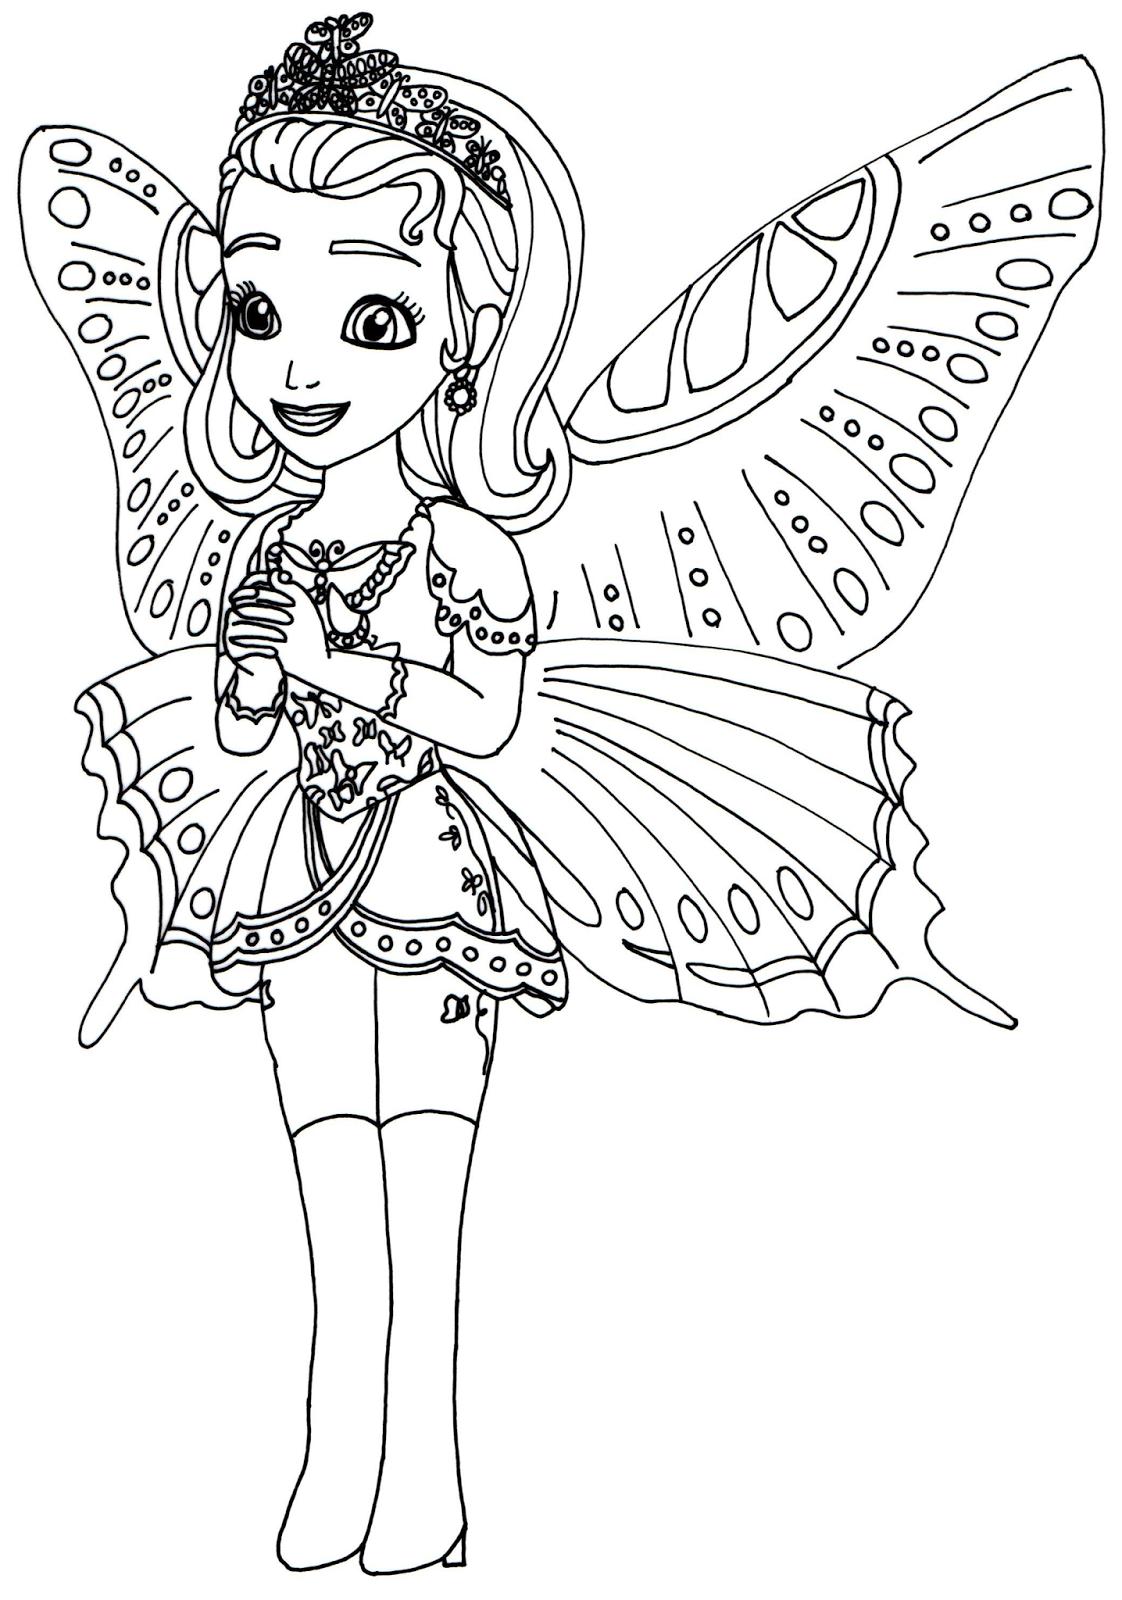 Princess amber coloring pages - Princess Amber Coloring Pages 2